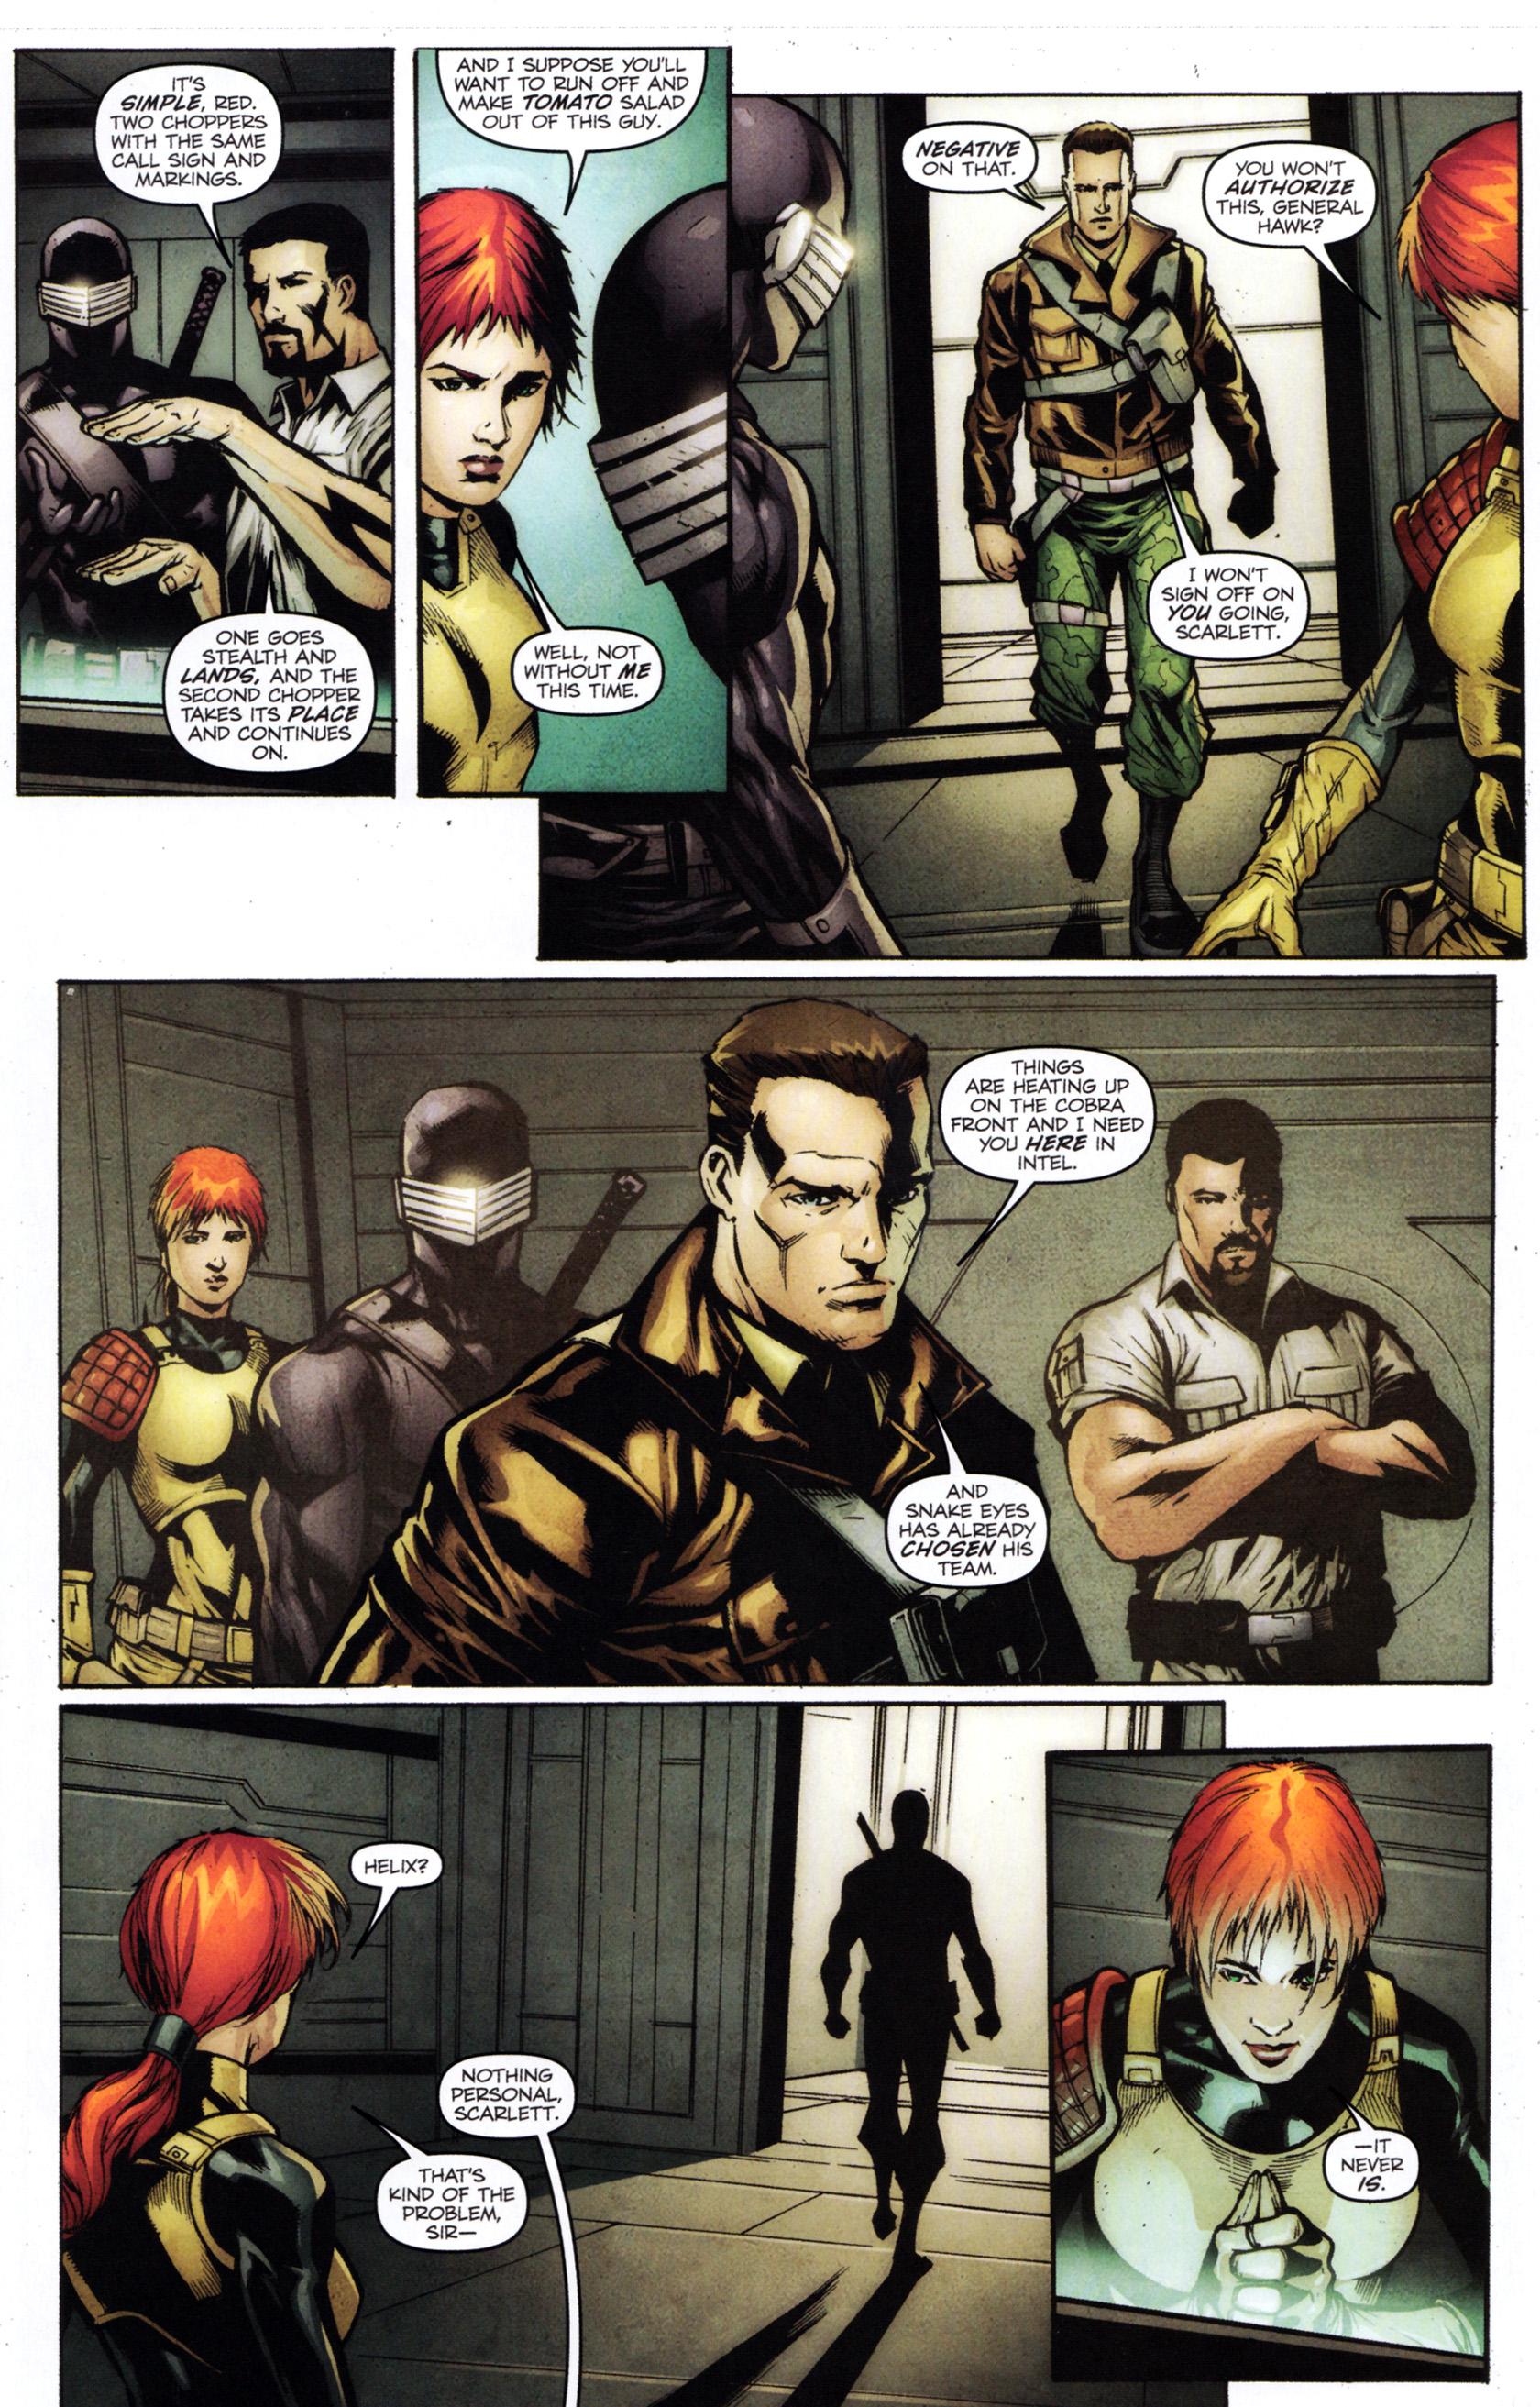 Read online G.I. Joe: Snake Eyes comic -  Issue #1 - 16